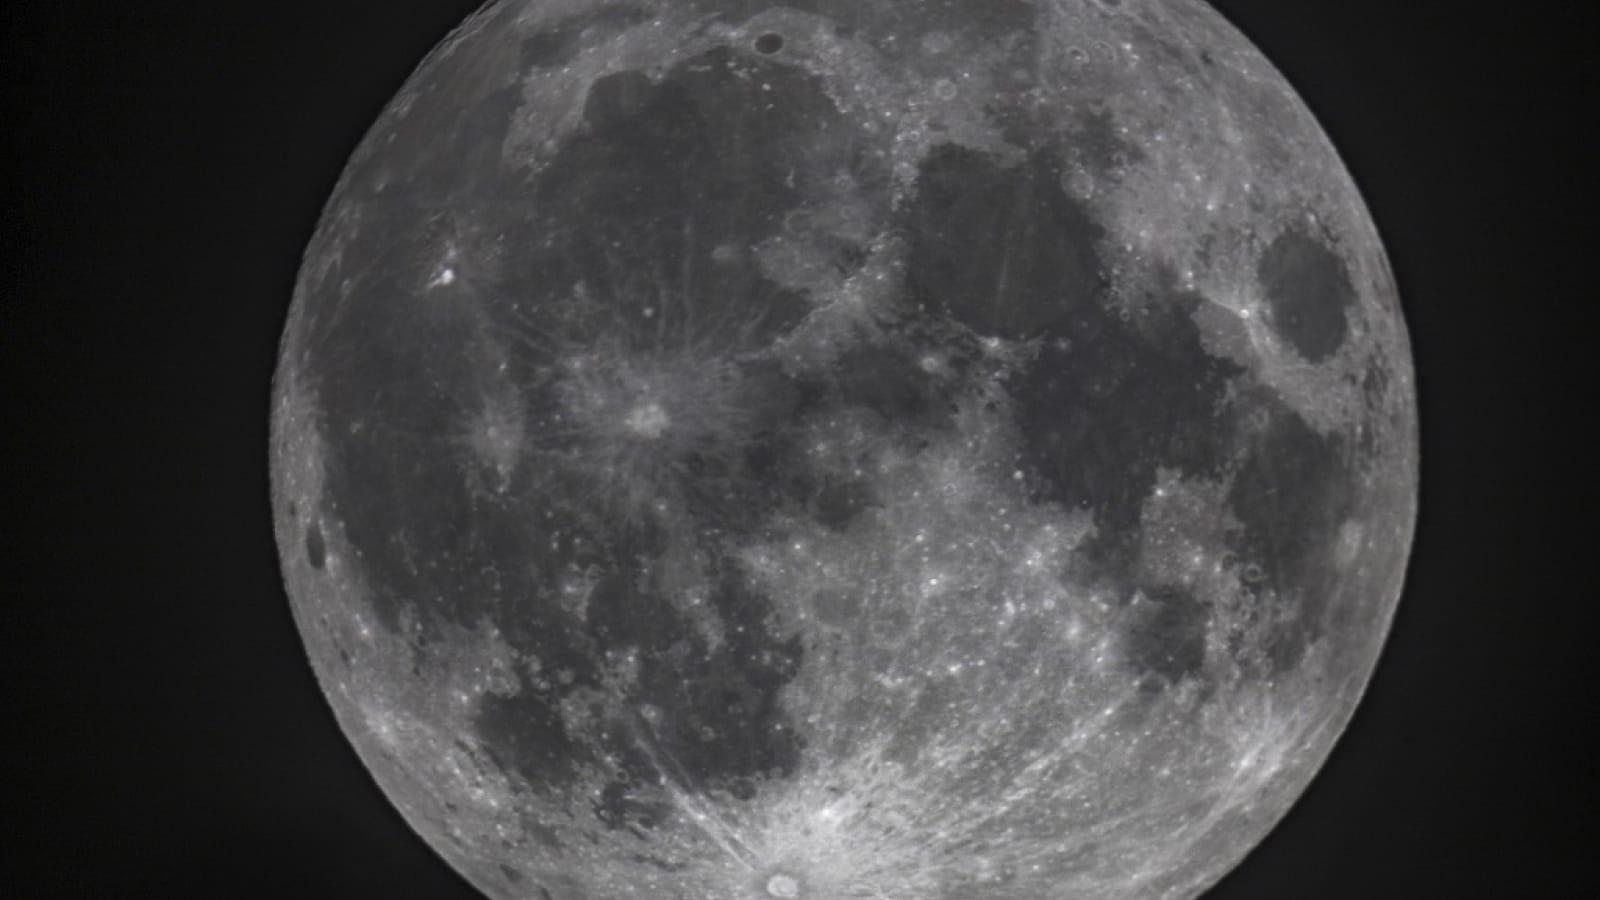 Lune-1024-b473010c30e24dada8c9be0a6570b0bc